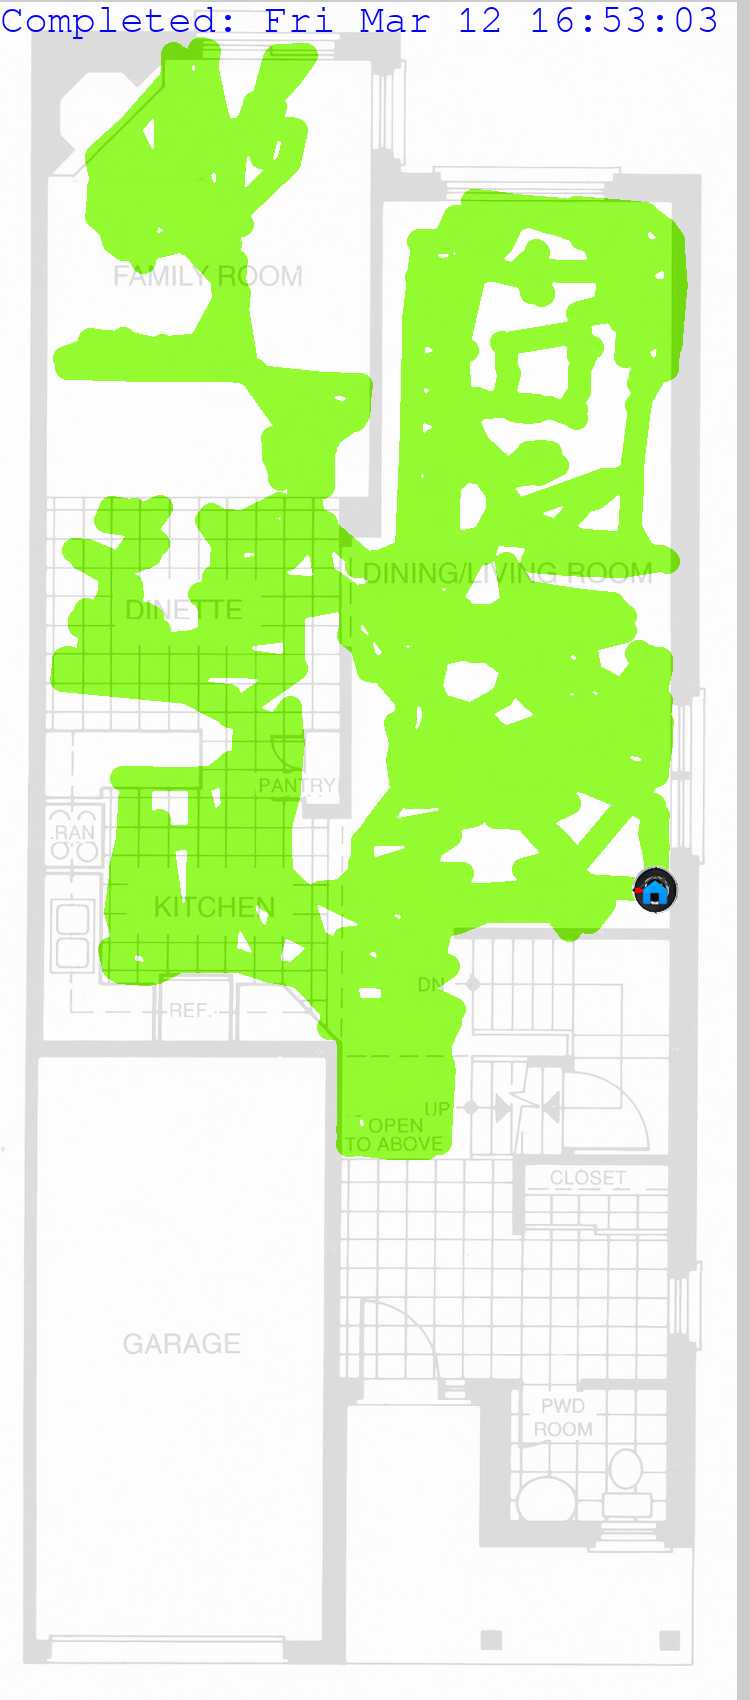 iRobot Roomba cleaning map using roomba lib